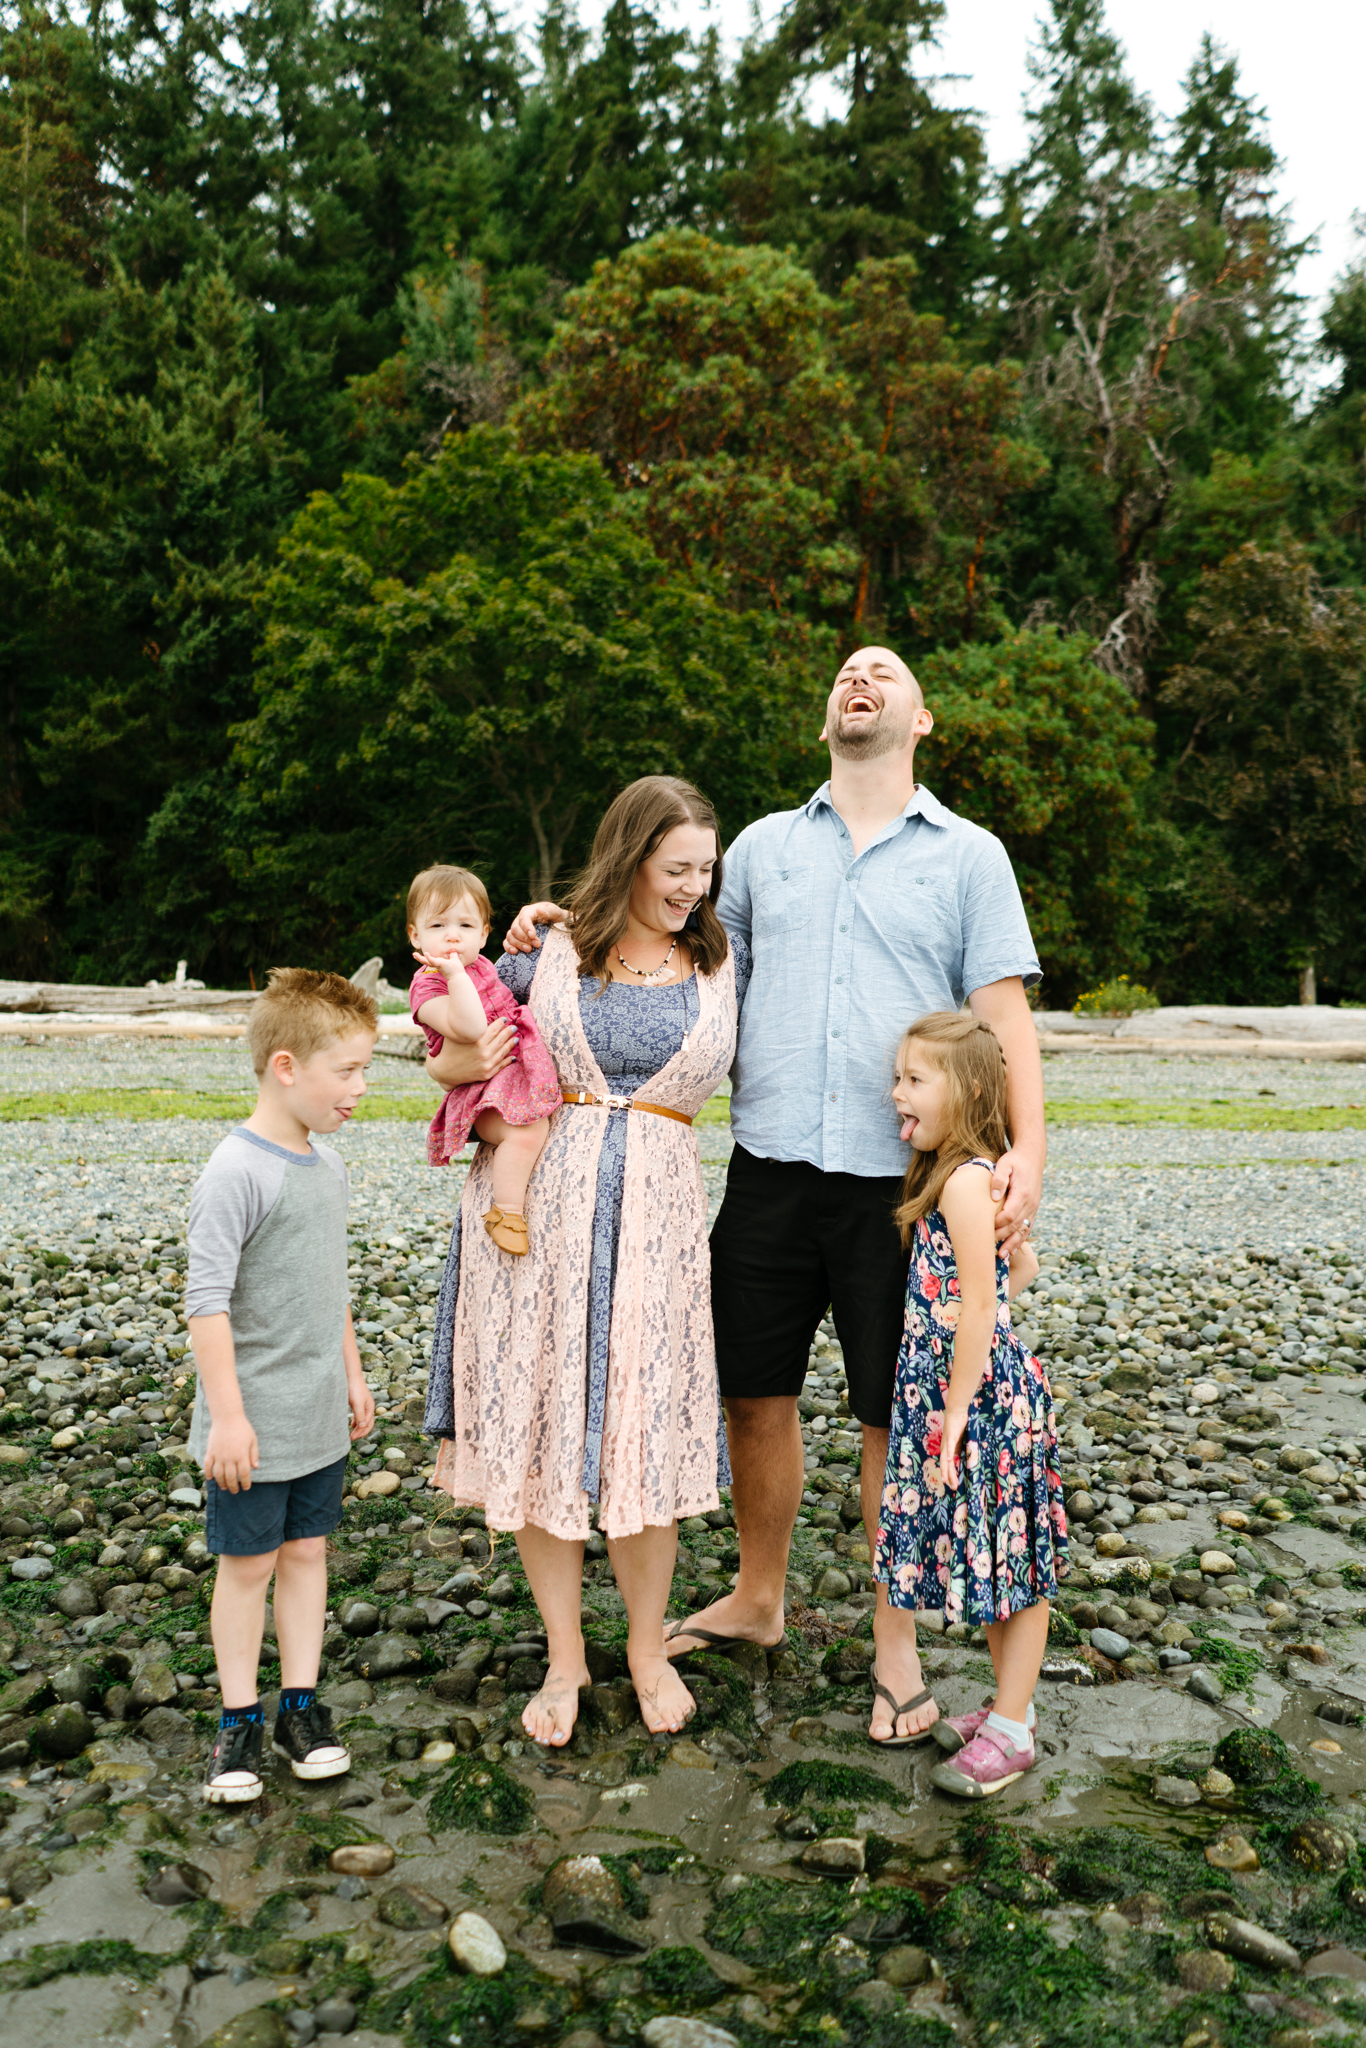 Family Portrait Locations in Seattle